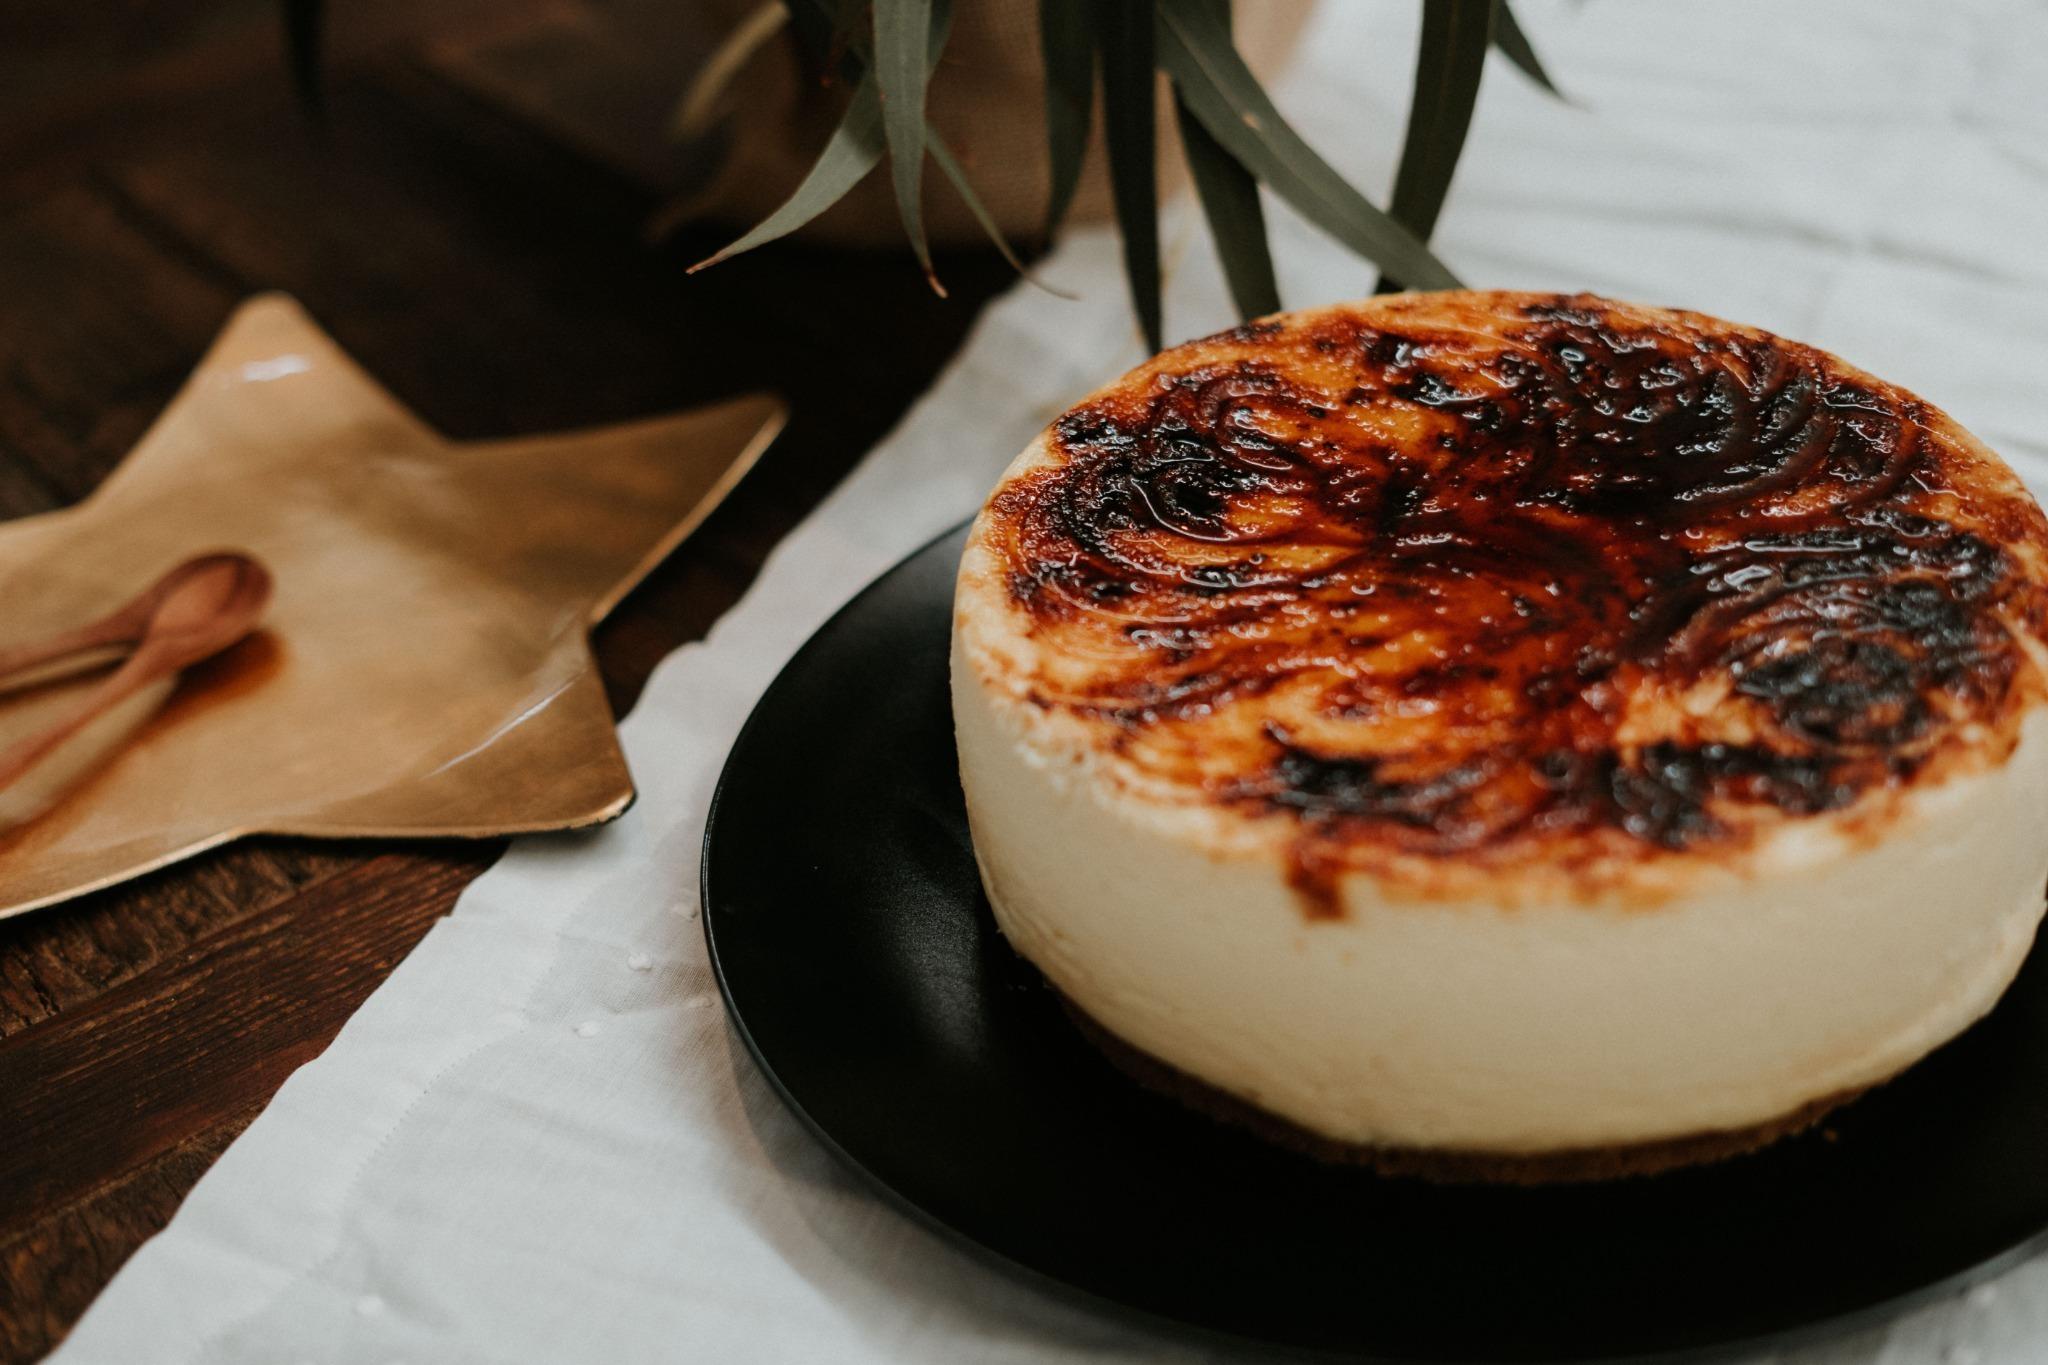 Chis & Keik, Jack Daniel's cheesecake